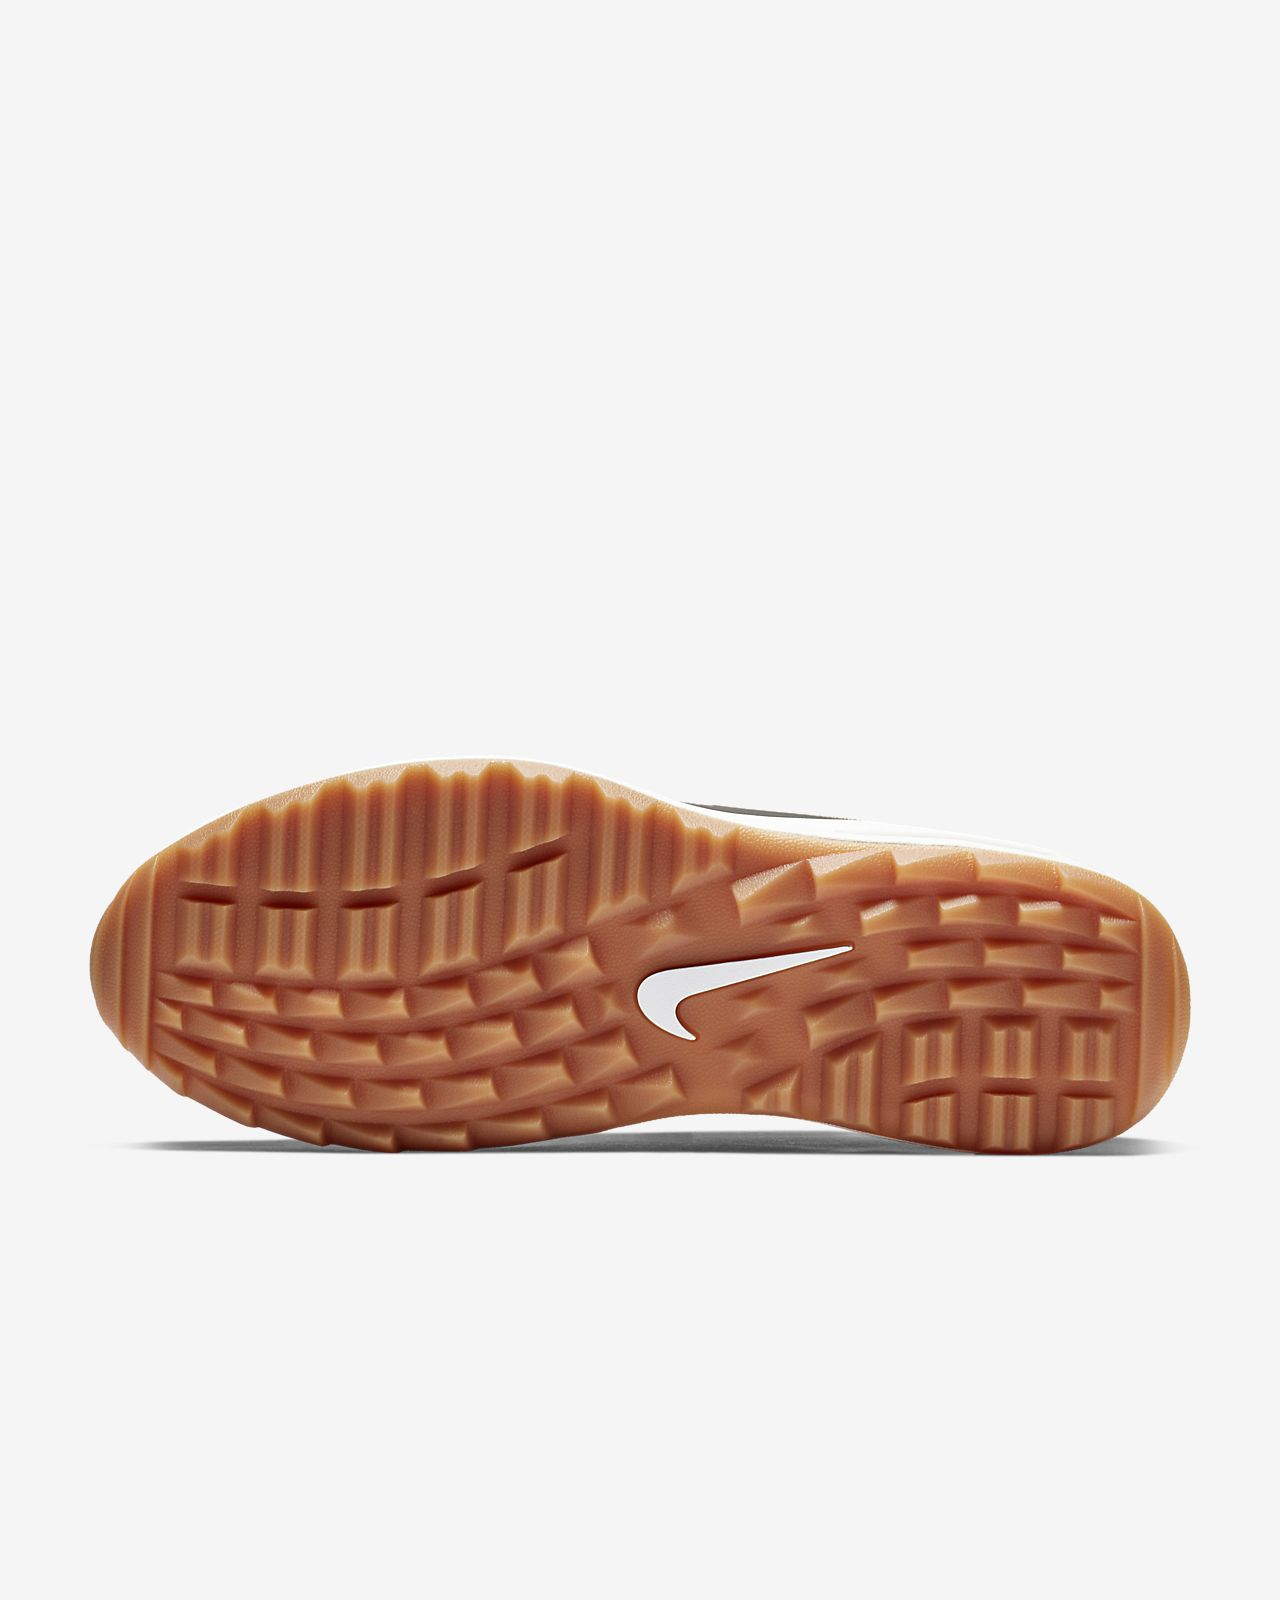 Nike Women's Air Max 1 G Golf Shoes BlackBronzeWhite